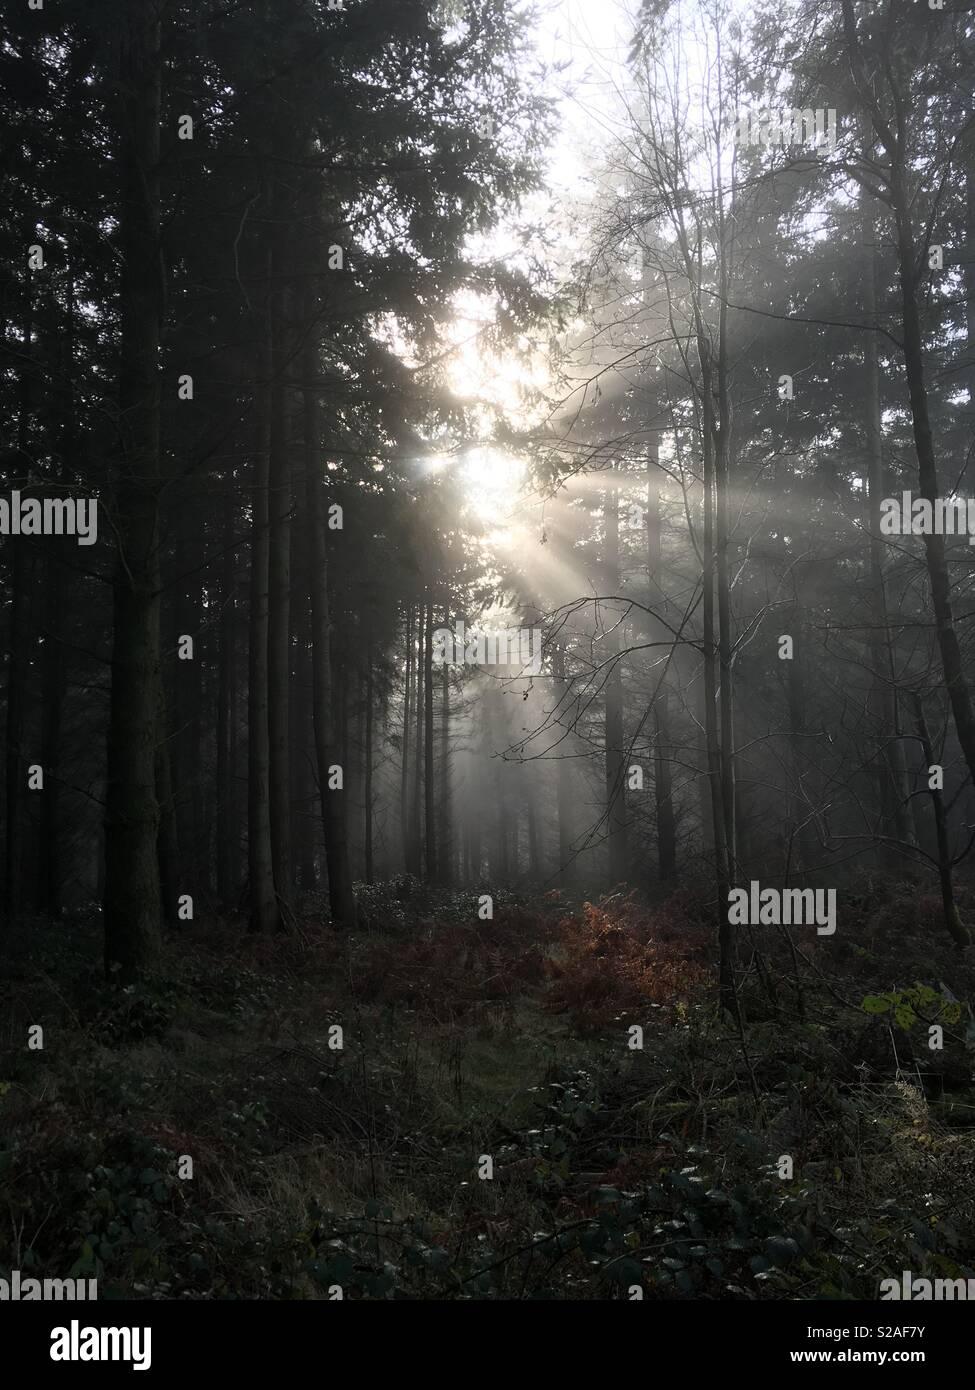 Misty mornings - Stock Image